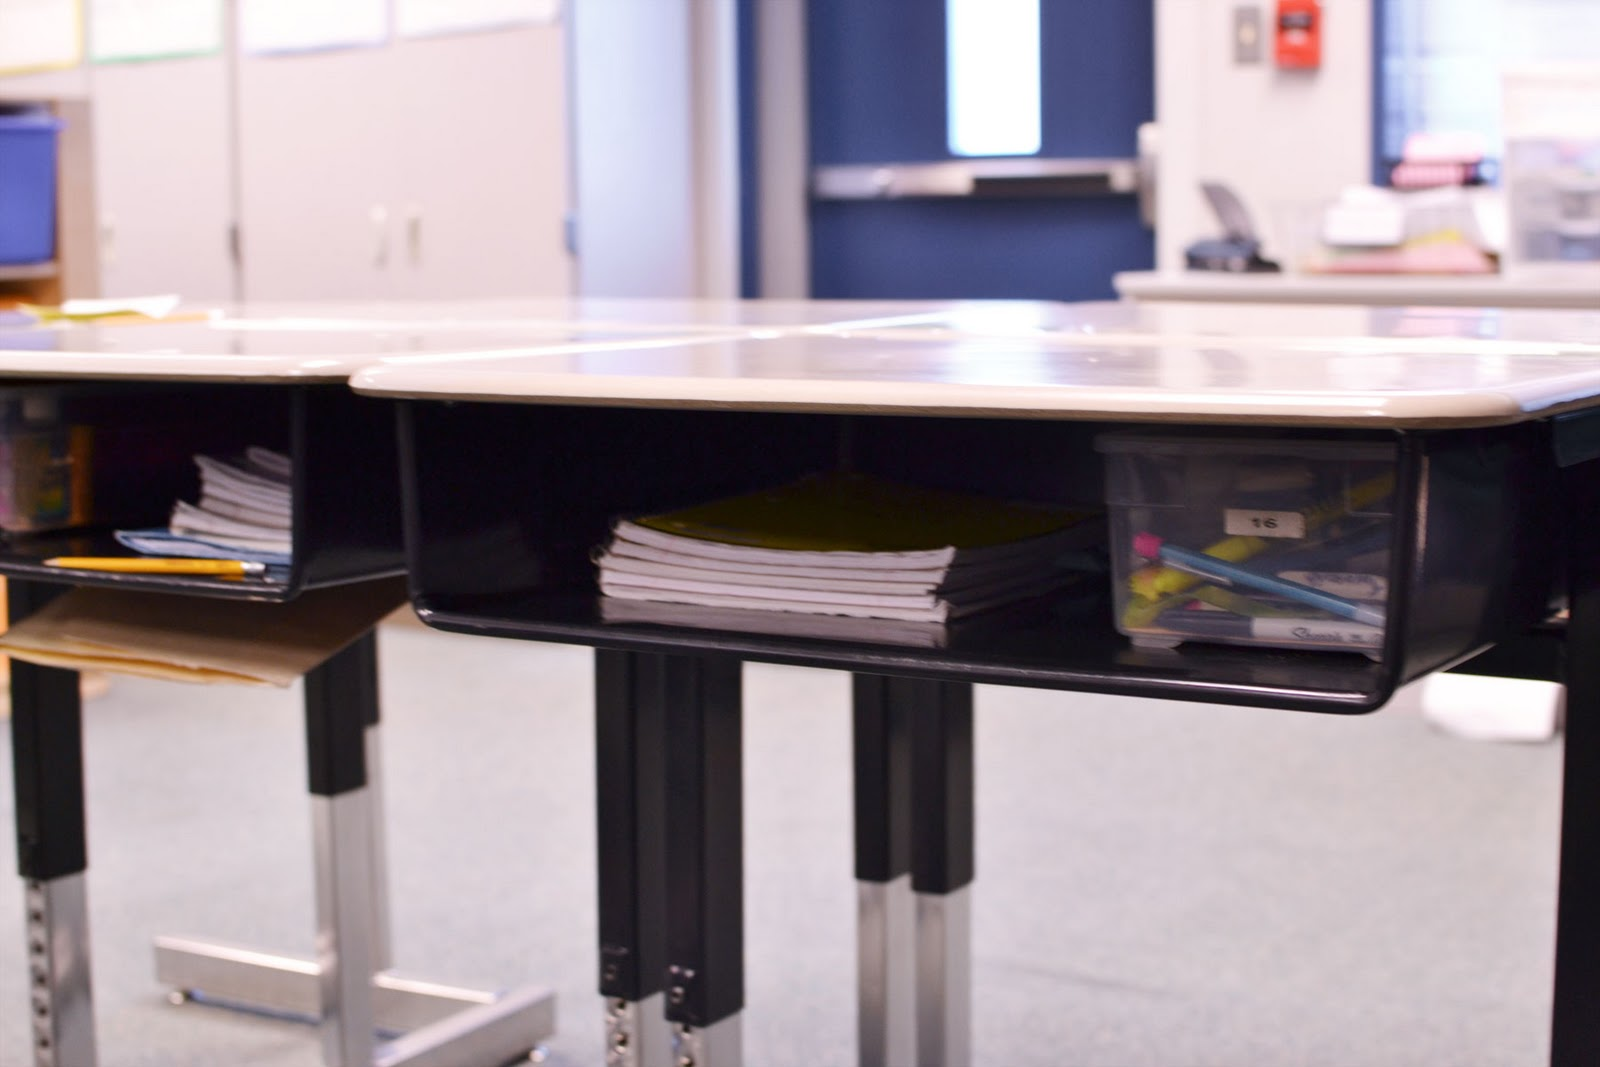 Heidi Has A Hobby Potd Day 186 Clean Desk, Messy Desk. Nail Desks For Sale. Drawer Microwaves Ovens. Yoga For Desk Workers. Bar Table For Kitchen. Light Oak Coffee Table. Drama Desk Awards. Index Card Drawer. Diy Music Workstation Desk